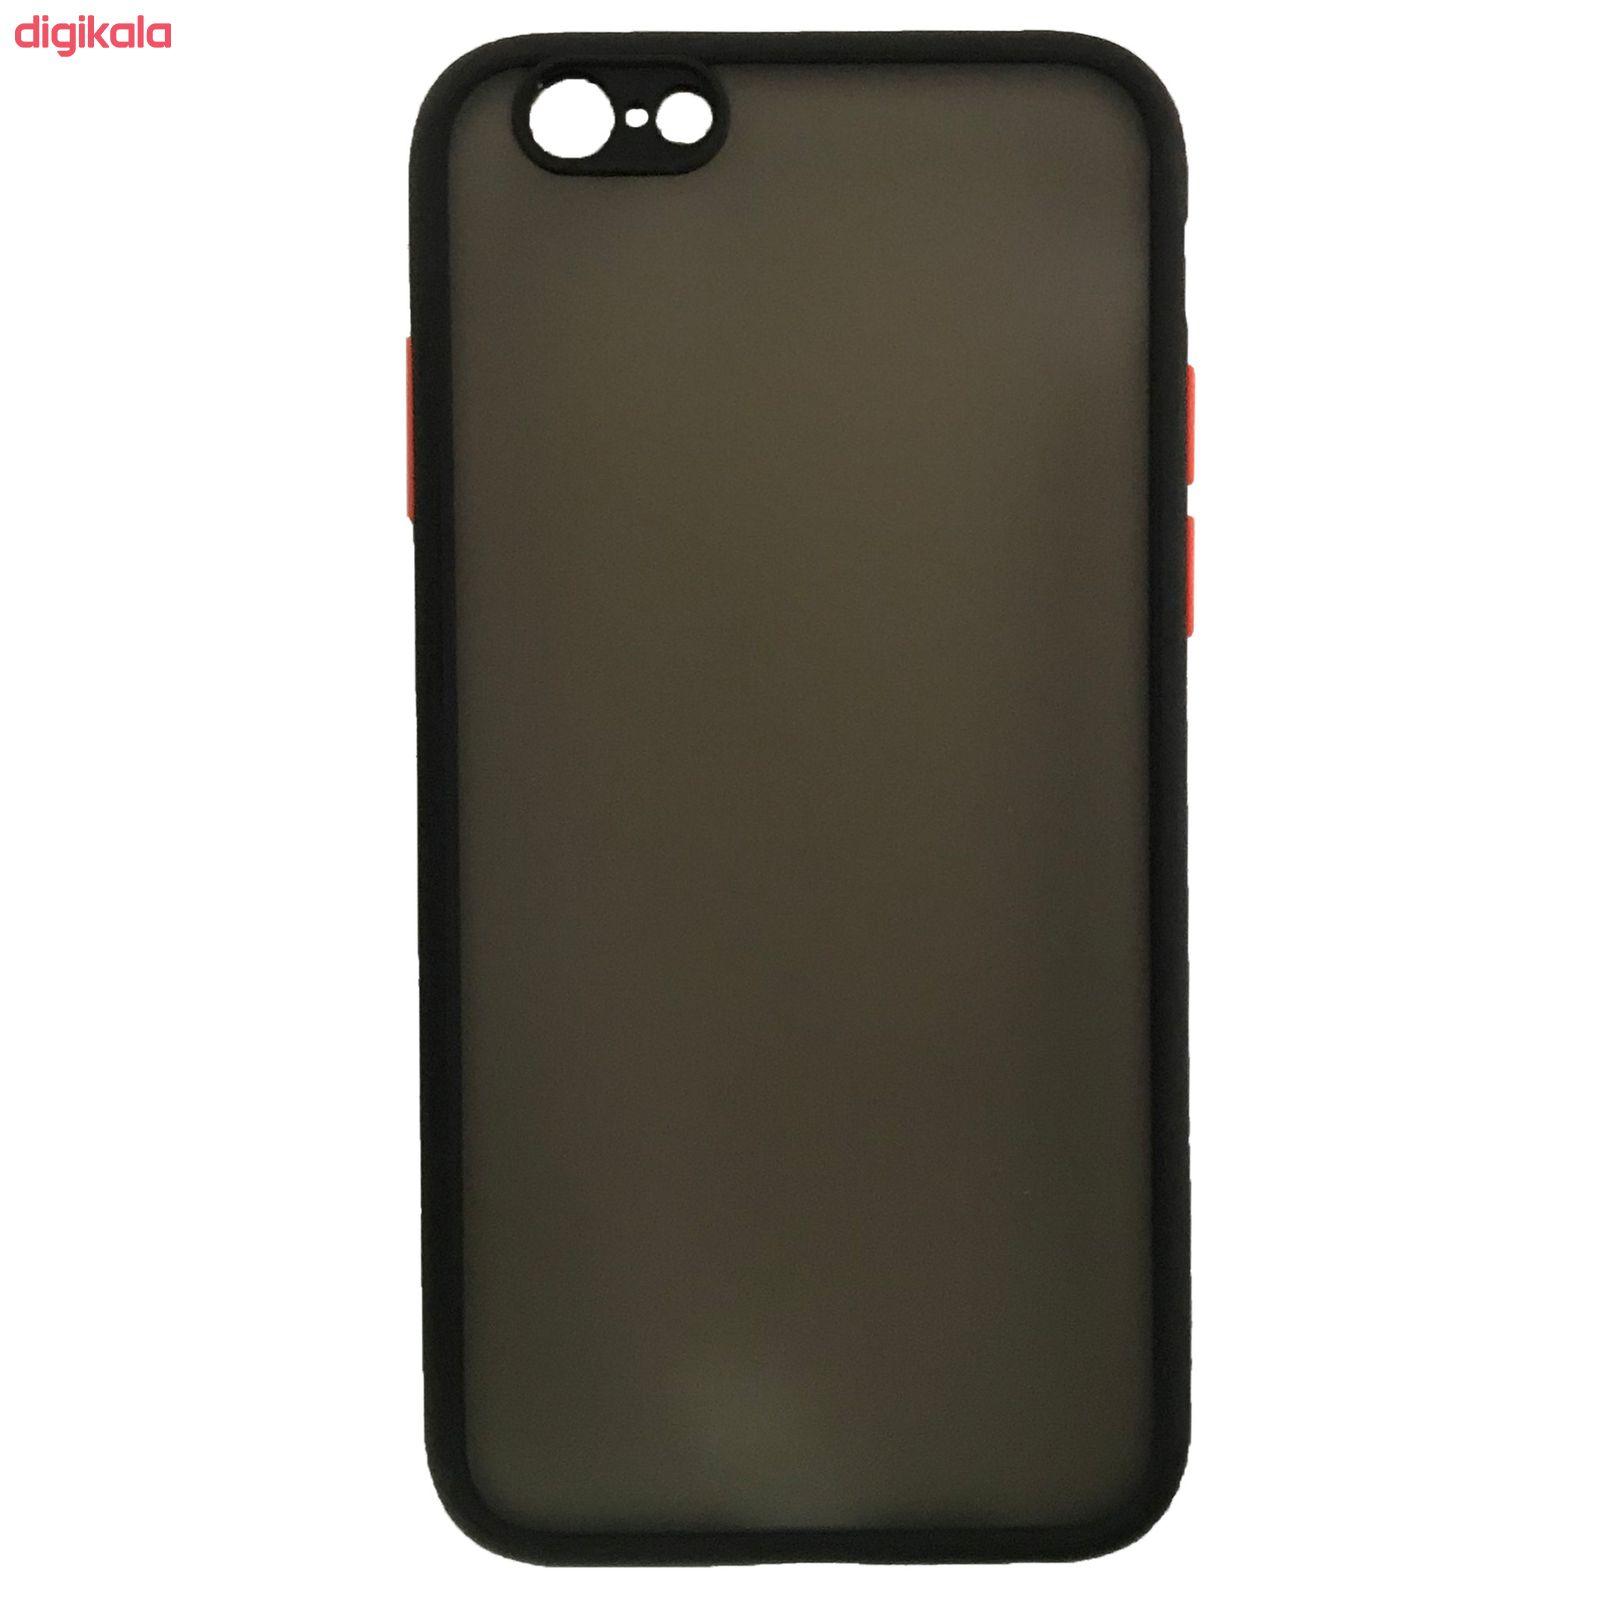 کاور مدل PM-6s مناسب برای گوشی موبایل اپل iPhone 6/6s main 1 2